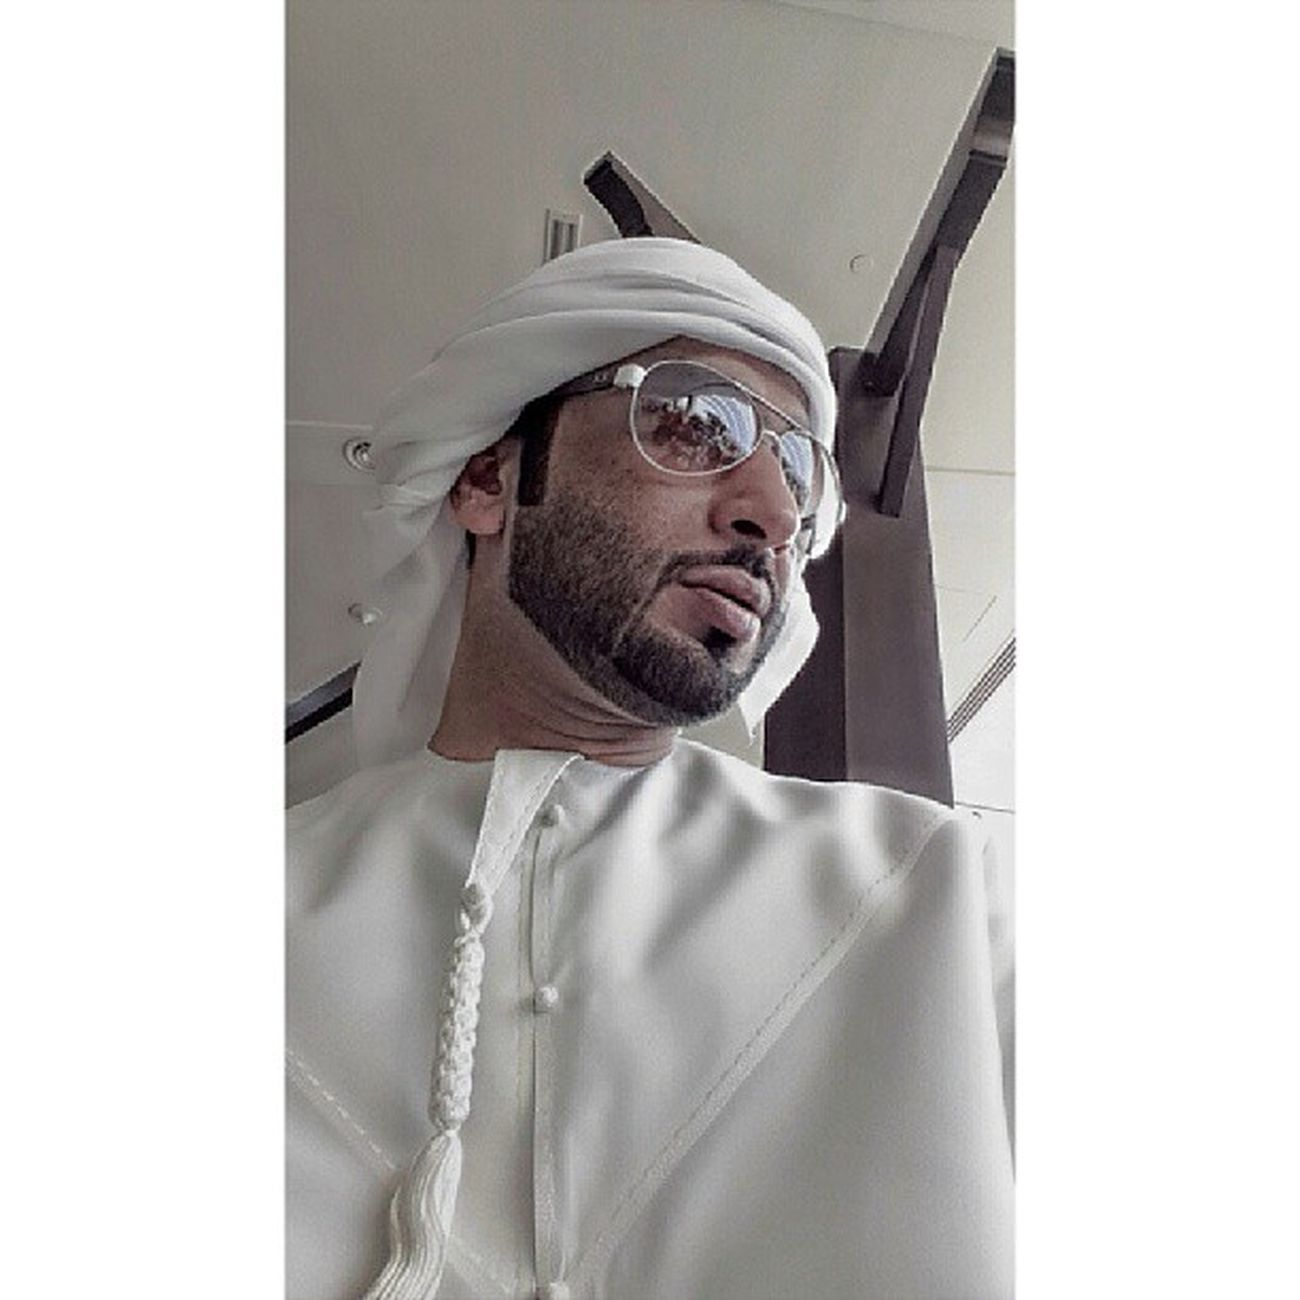 UAE DXB Dubai Jumeirah rakmyphotographyphotographydubaiphotographermediapressbestoftheday